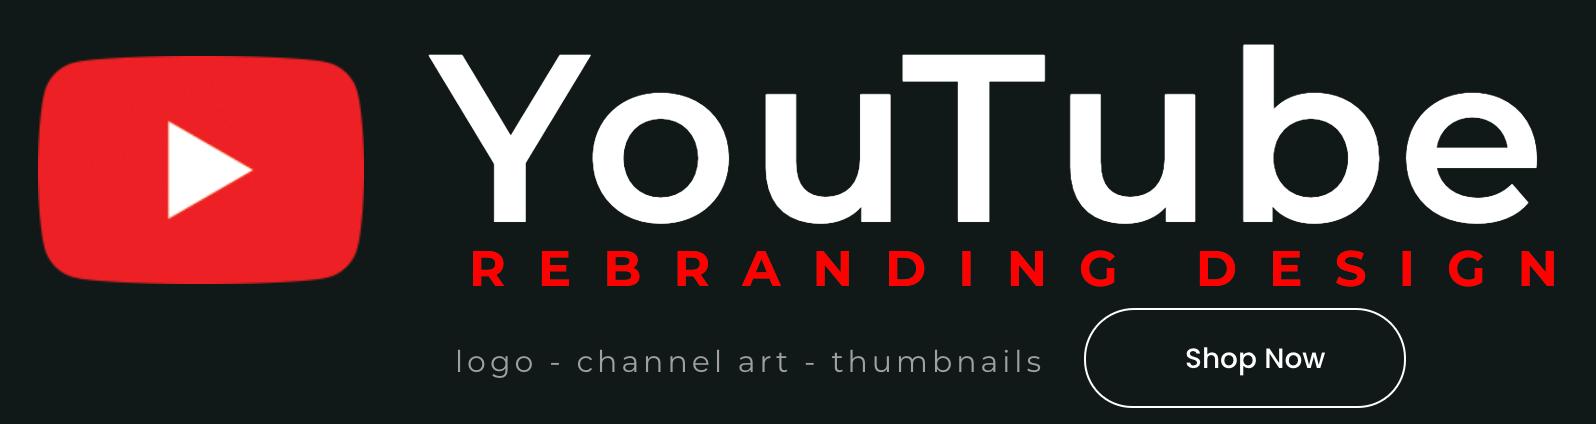 YouTube services bk42